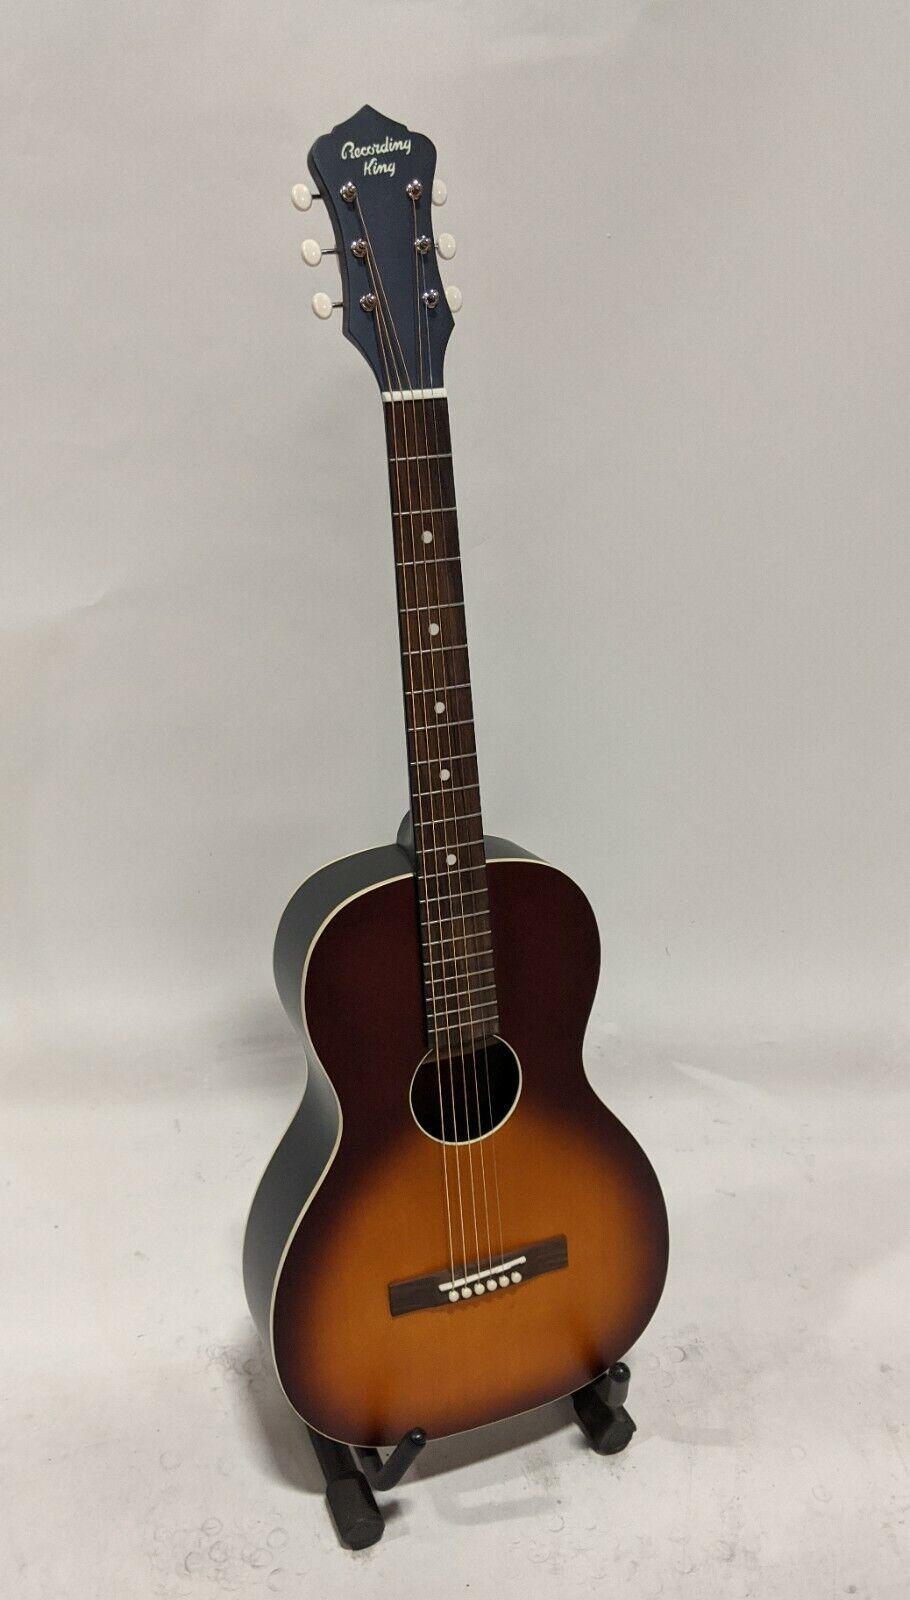 Recording King RPS-9-TS Dirty 30's Series 9 Single 0 Guitar, Tobacco Sunburst